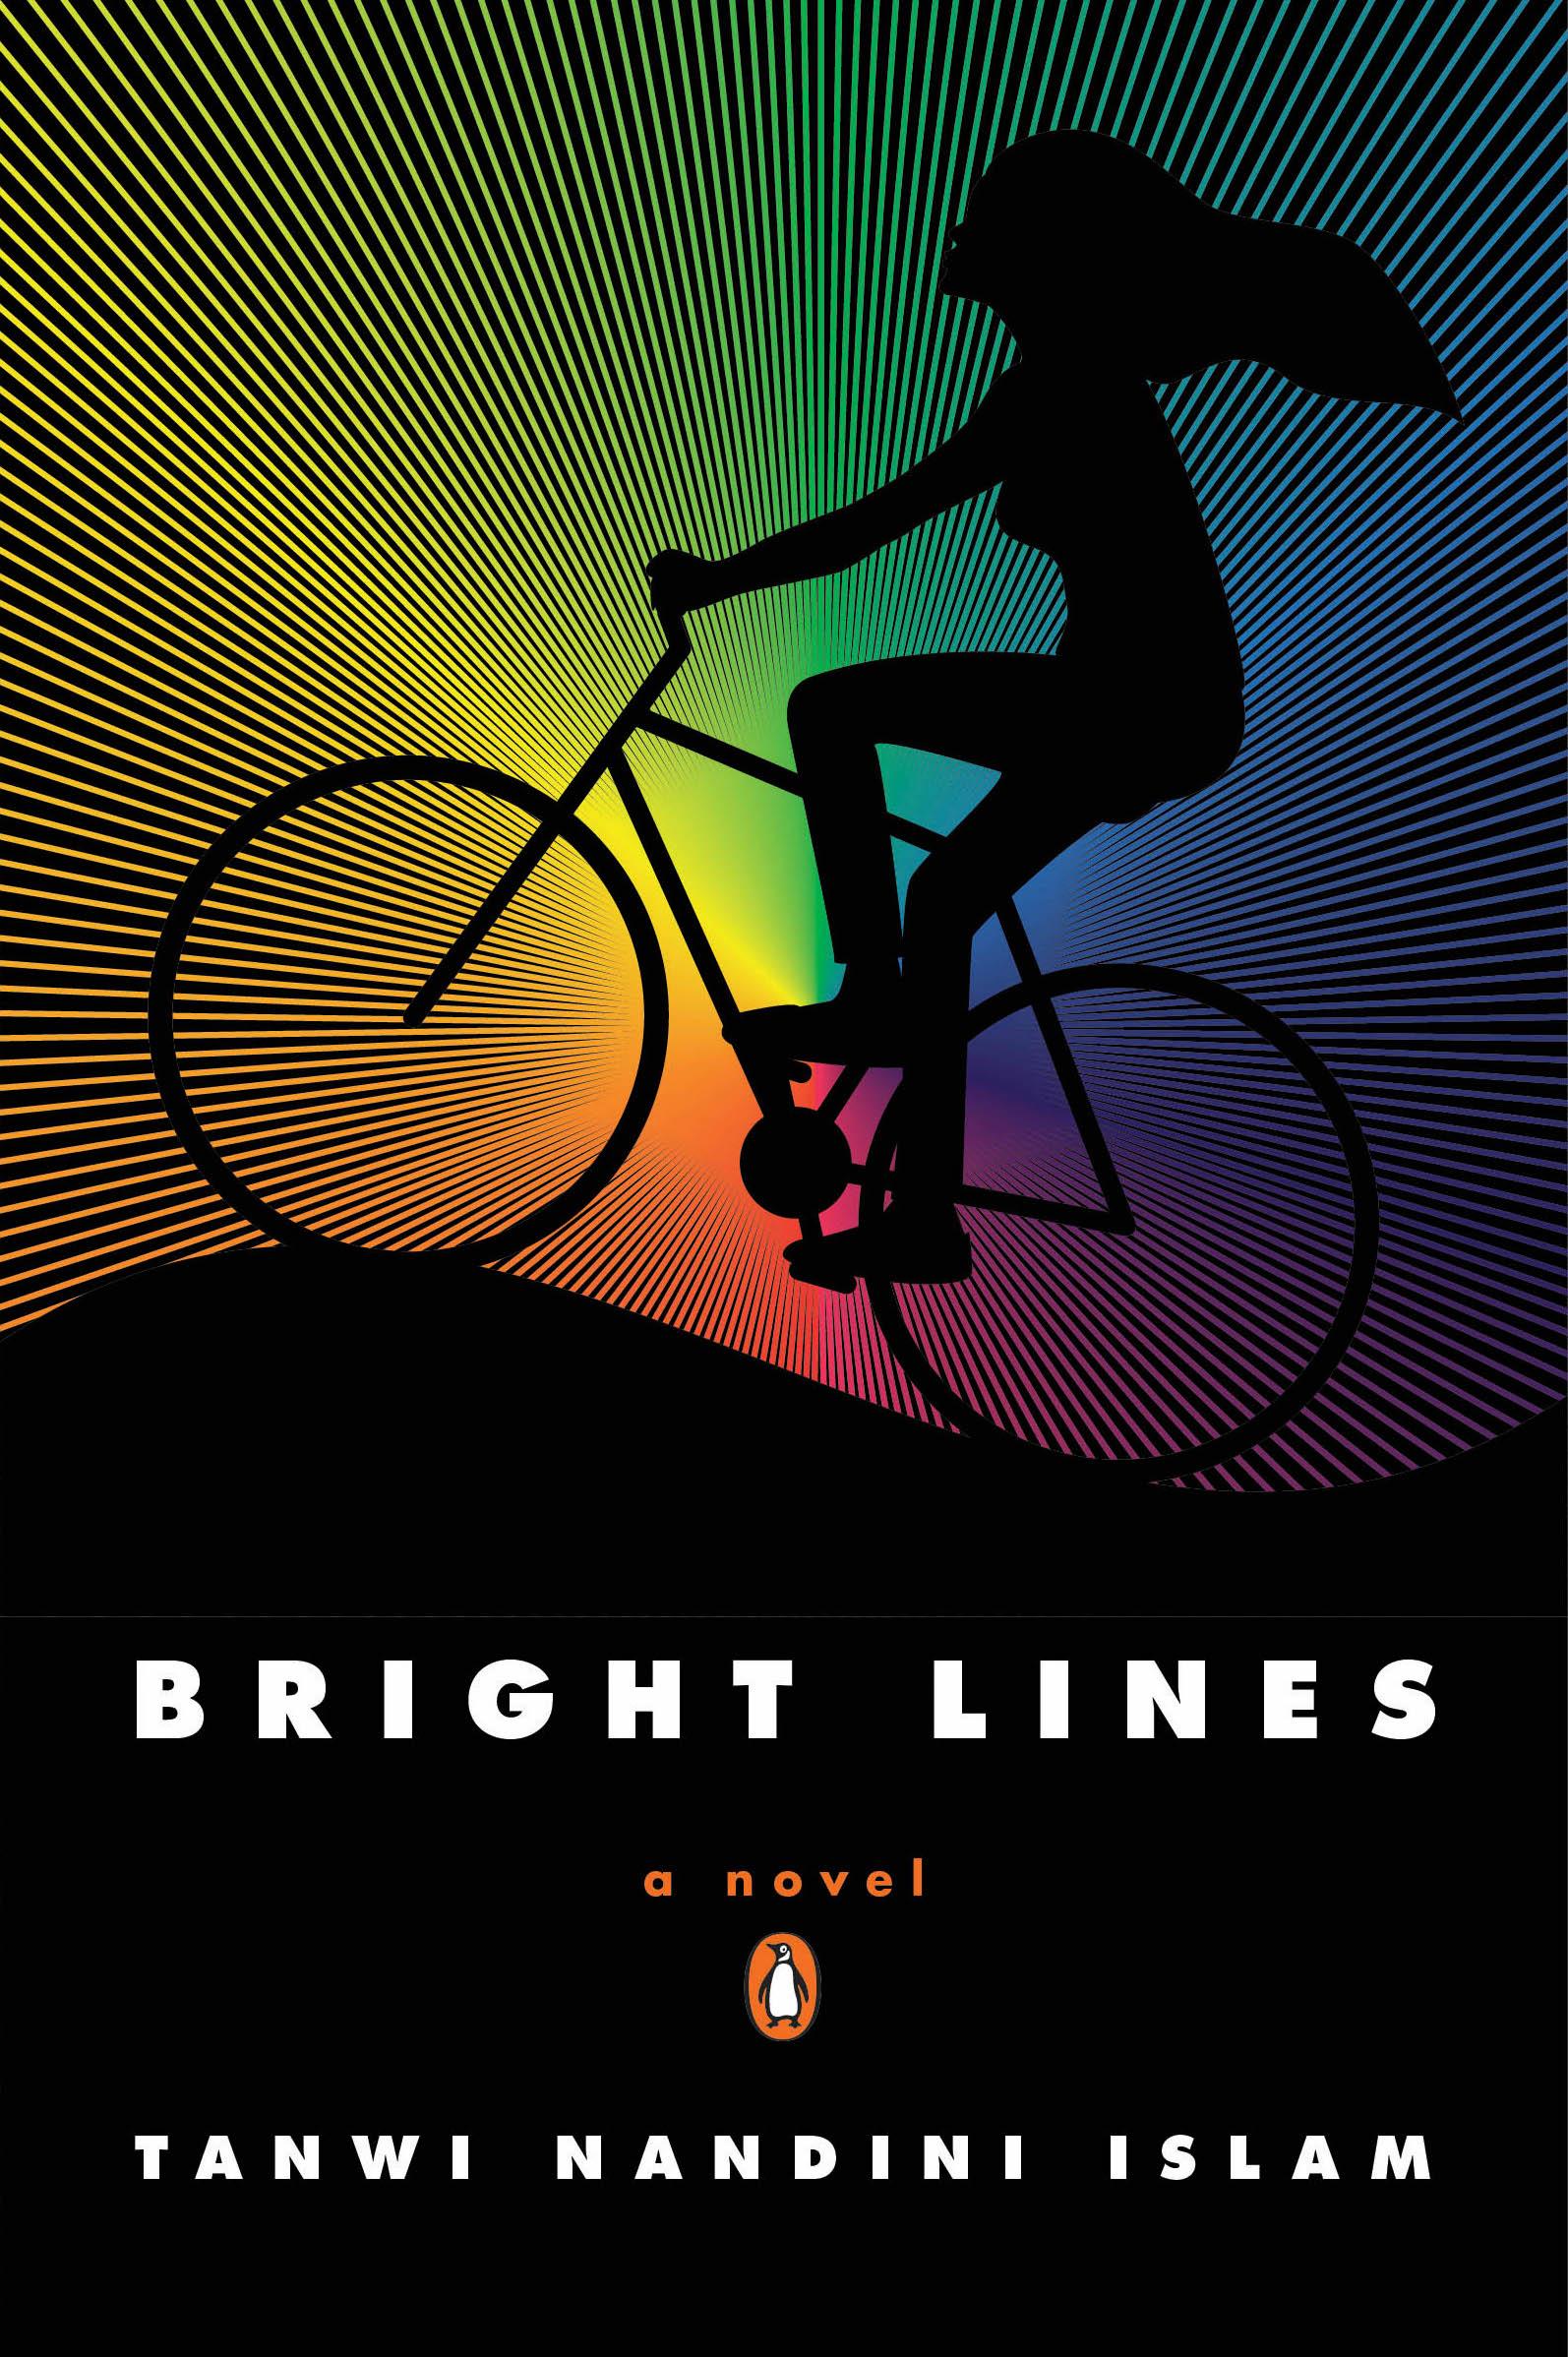 Bright Lines by Tanwi Nandini Islam